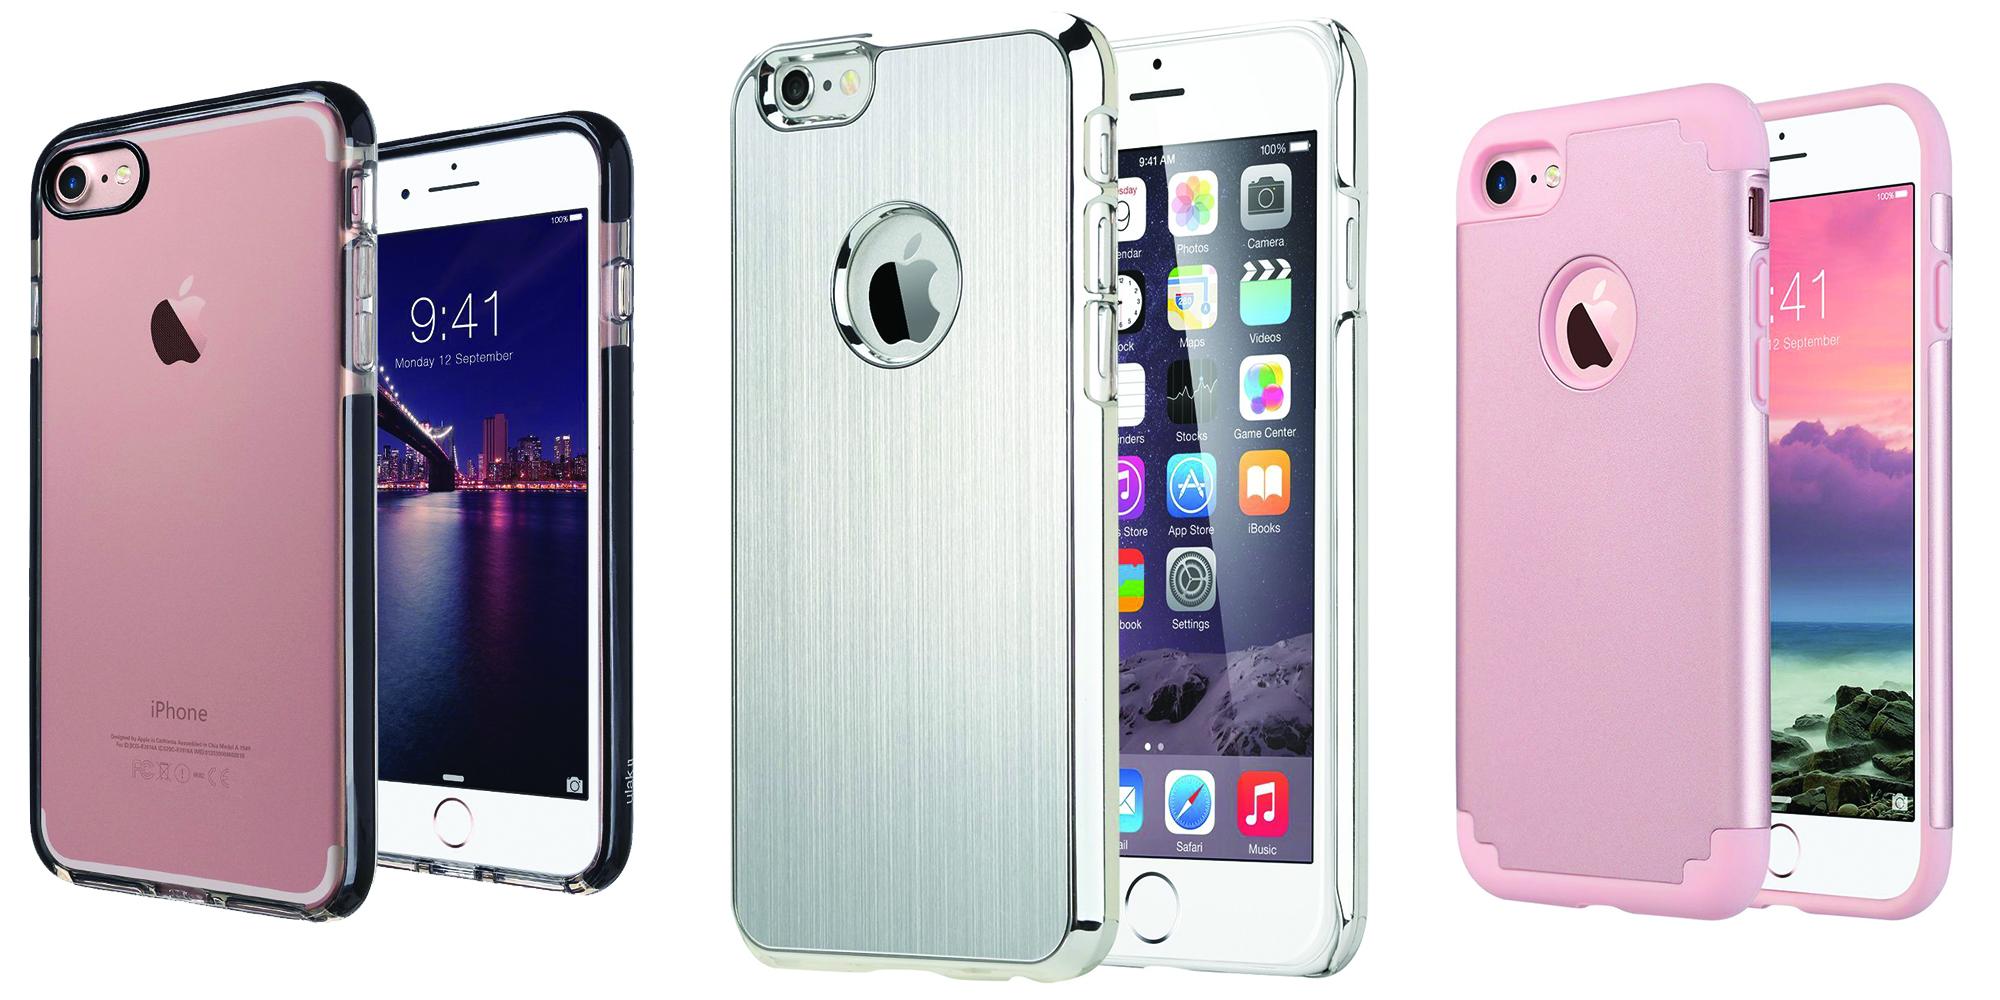 ulak-iphone-cases